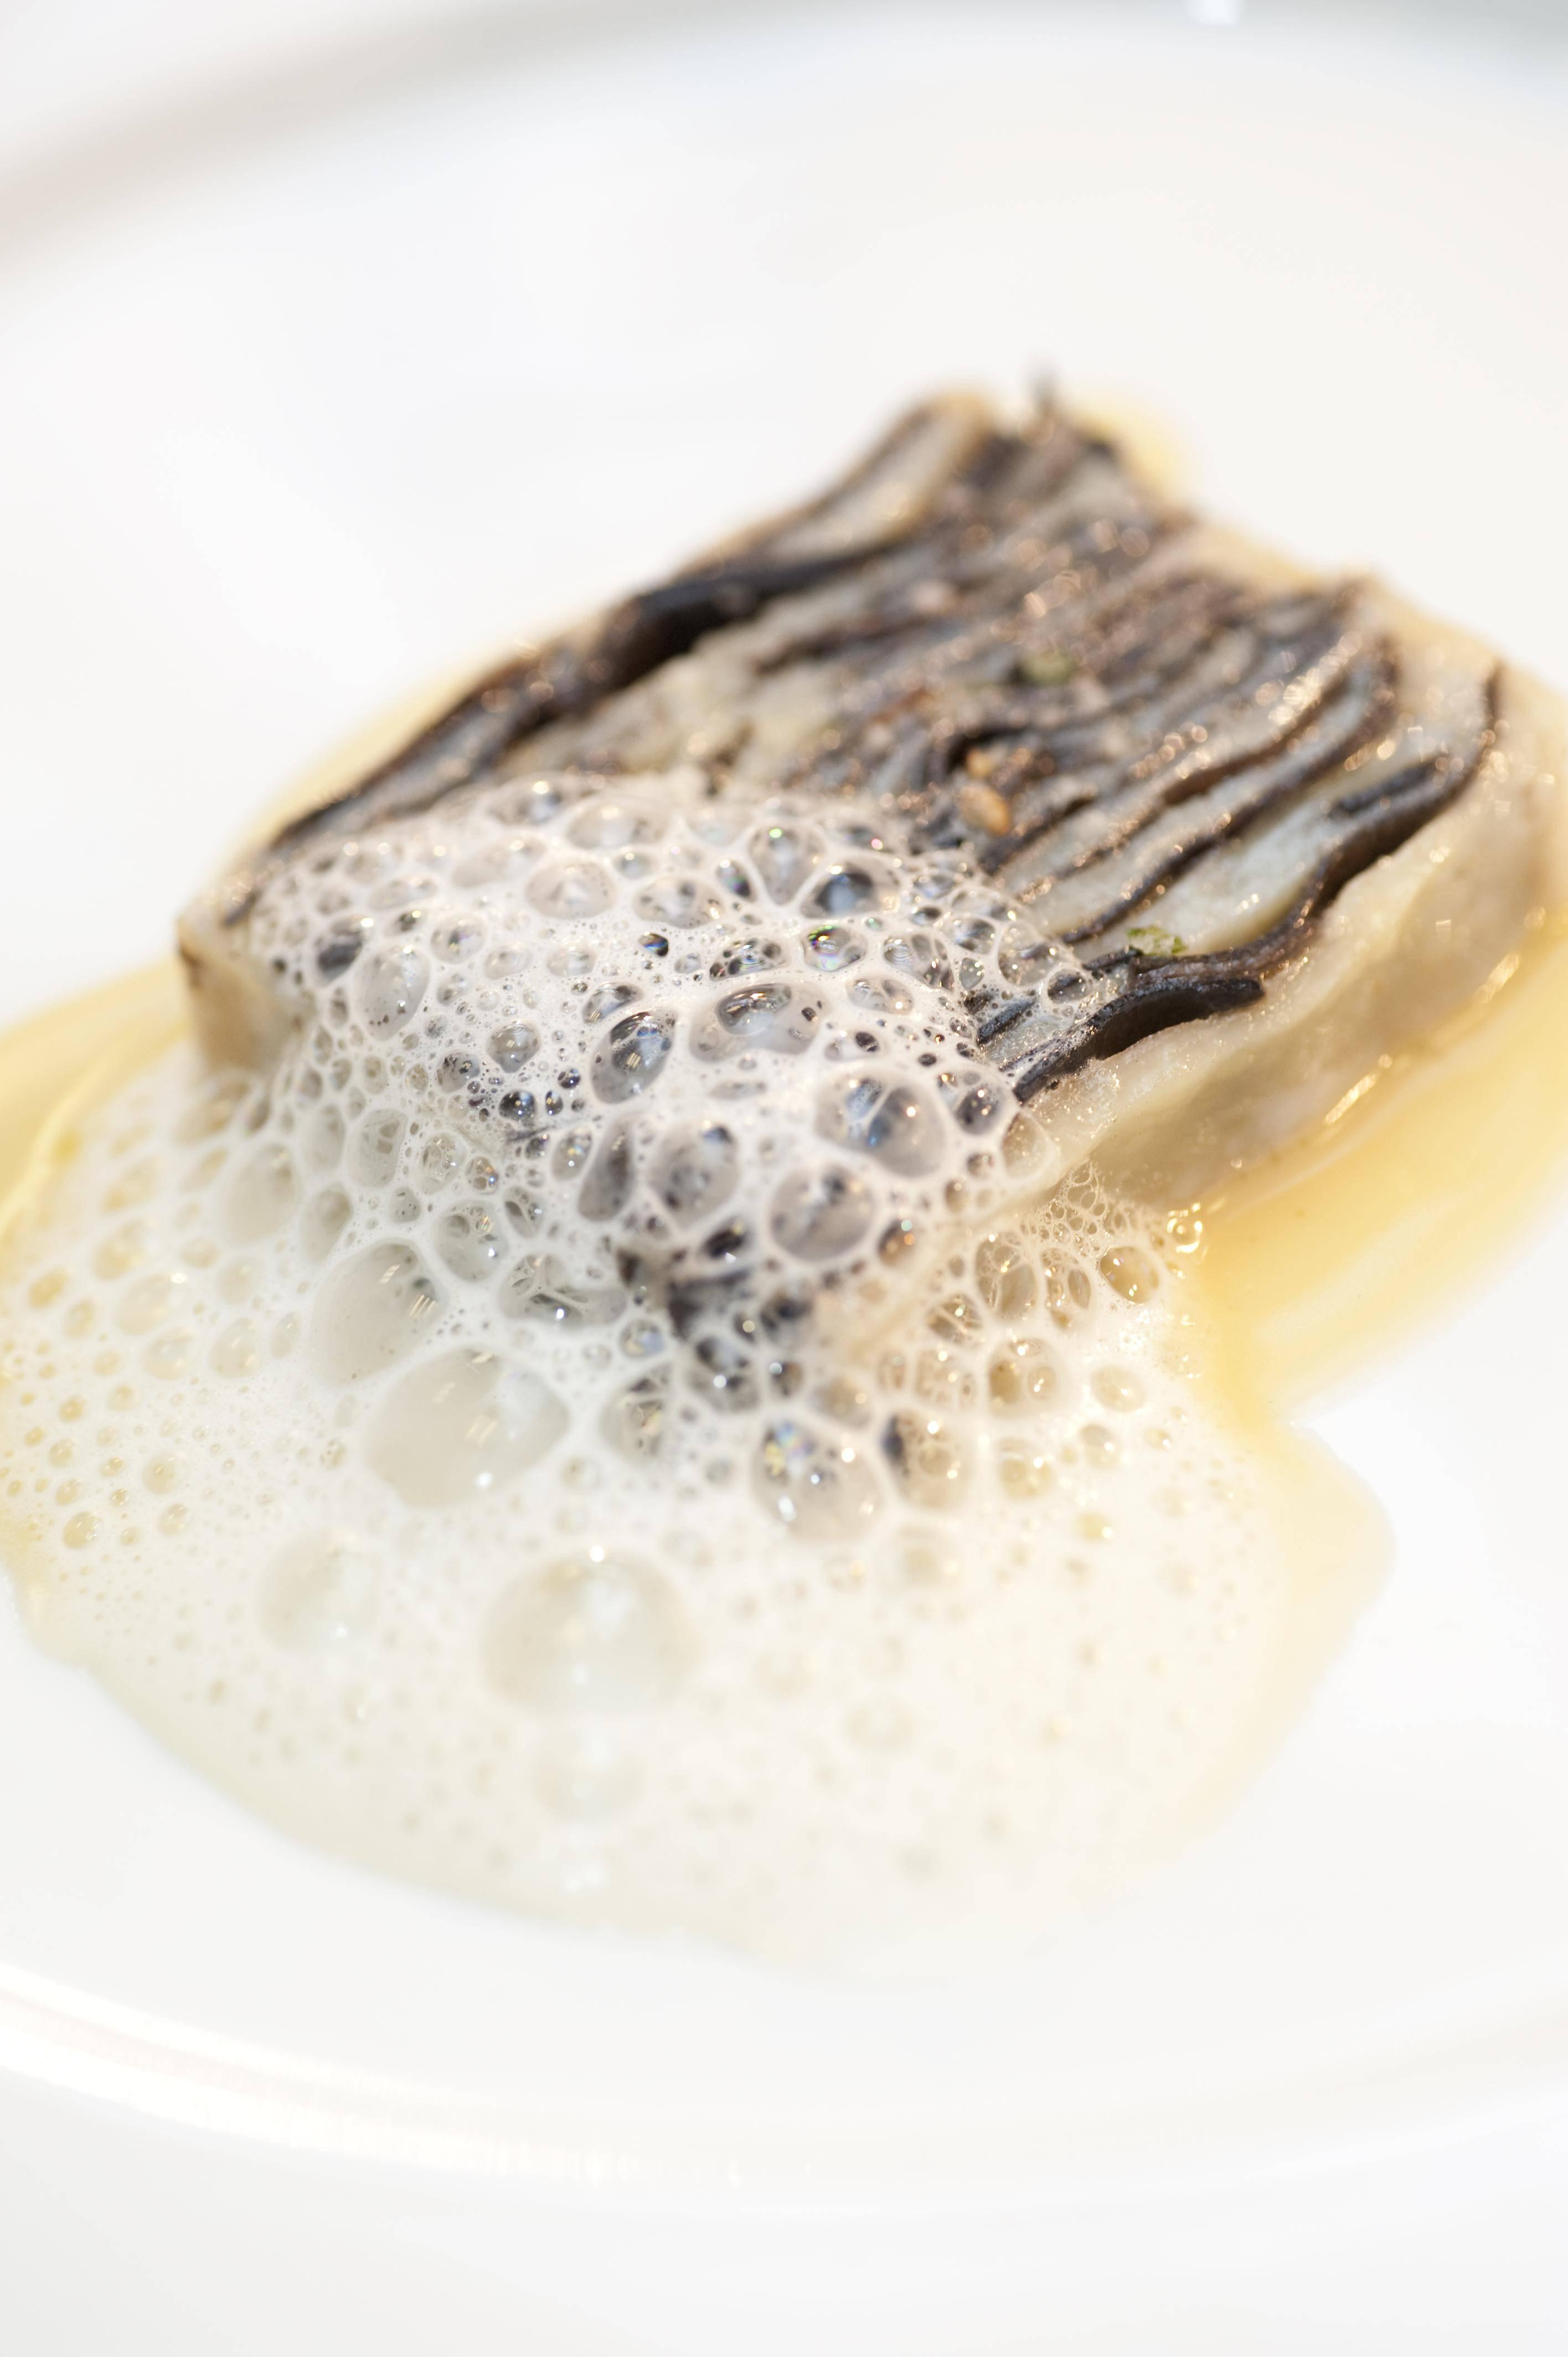 Sea Scallops Terrine with Black Truffle…Ó∫£…»±¥≈˜≈‰∫⁄À…¬∂